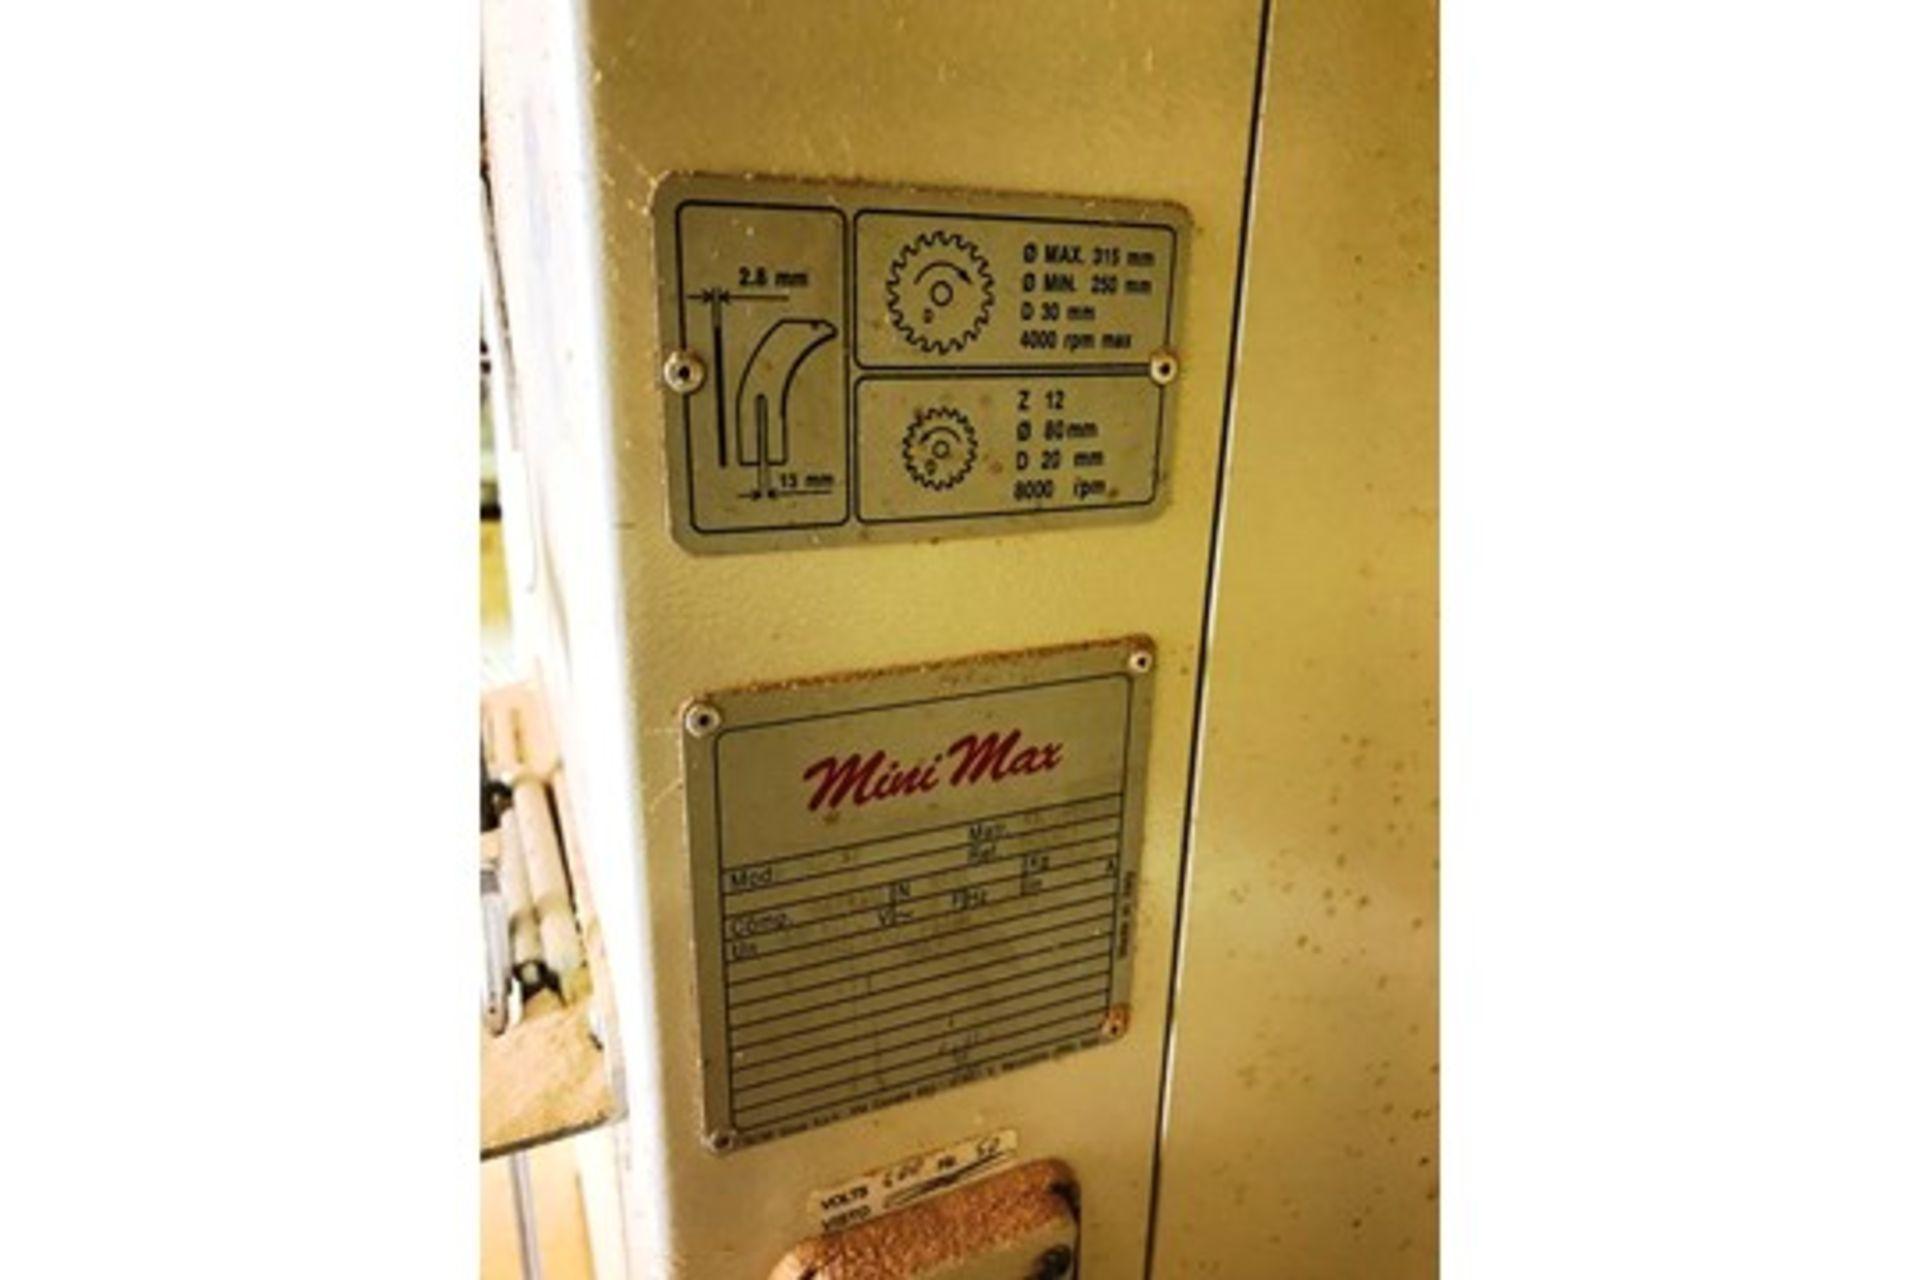 Lot 2 - SCM Mini Max SC3W Panel Saw | YOM: 2003